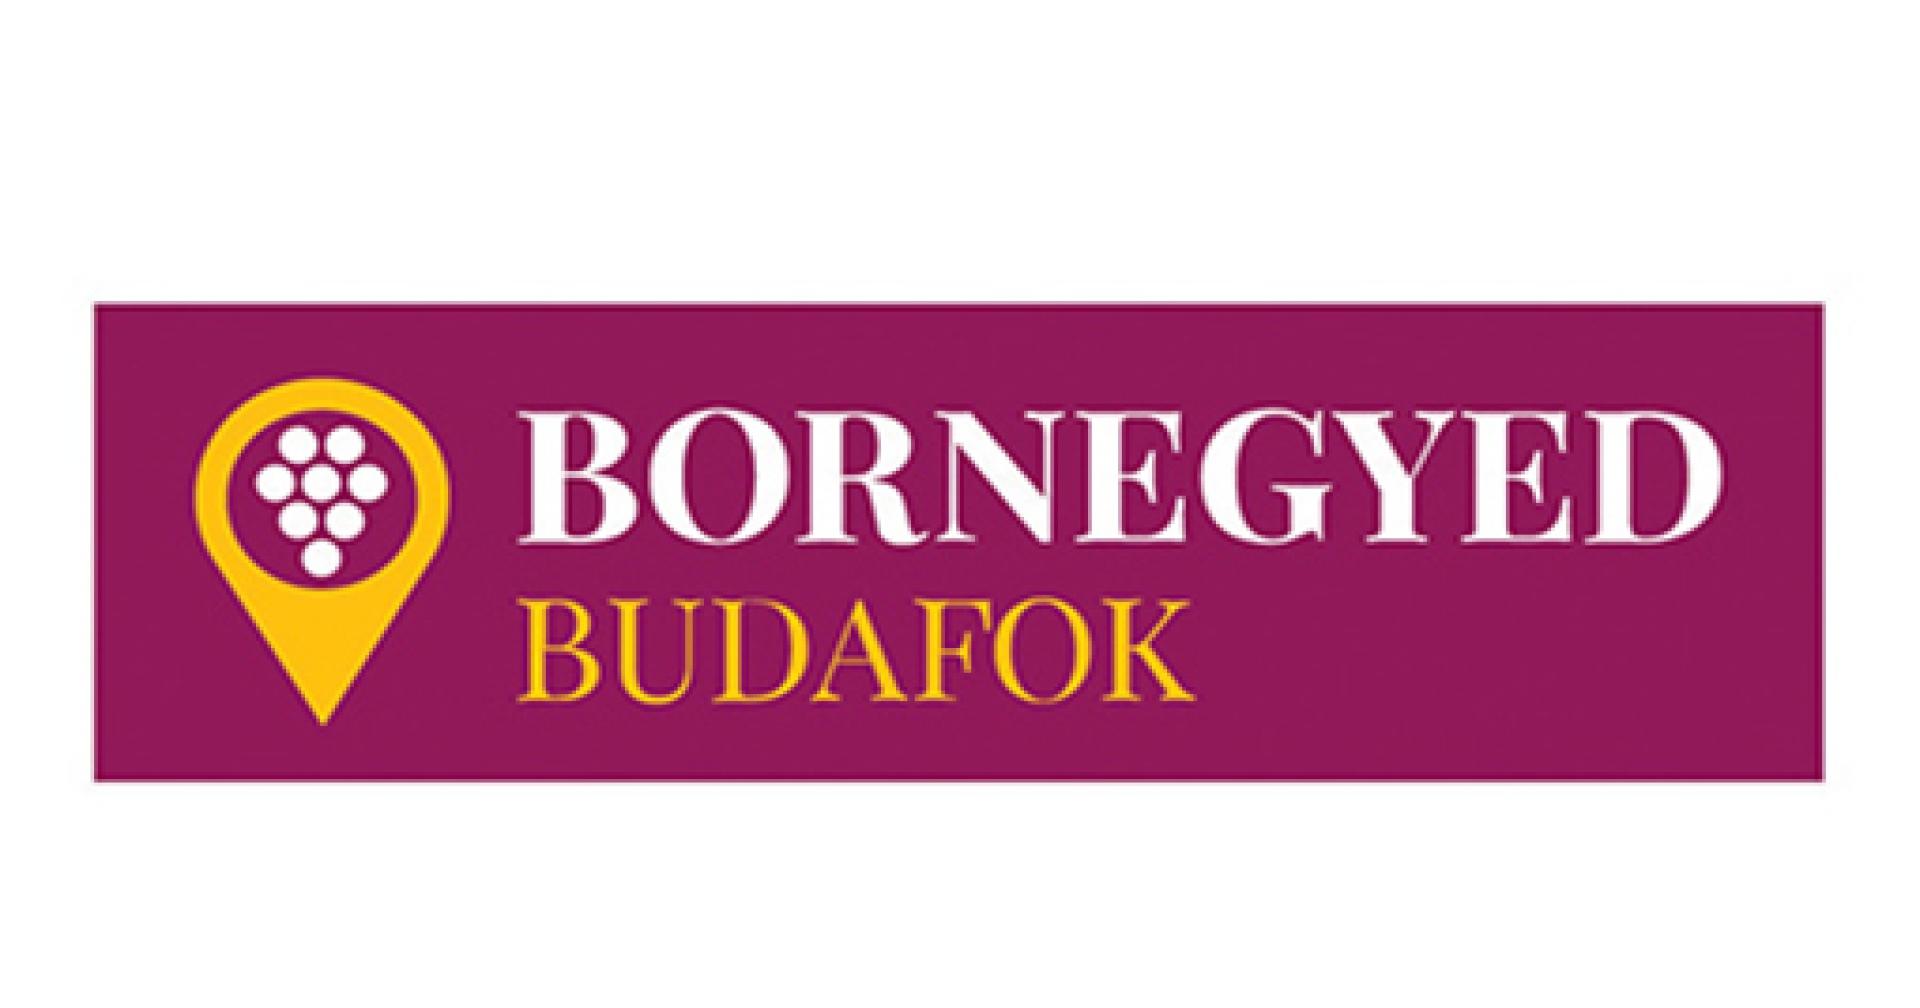 Bornegyed Budafok